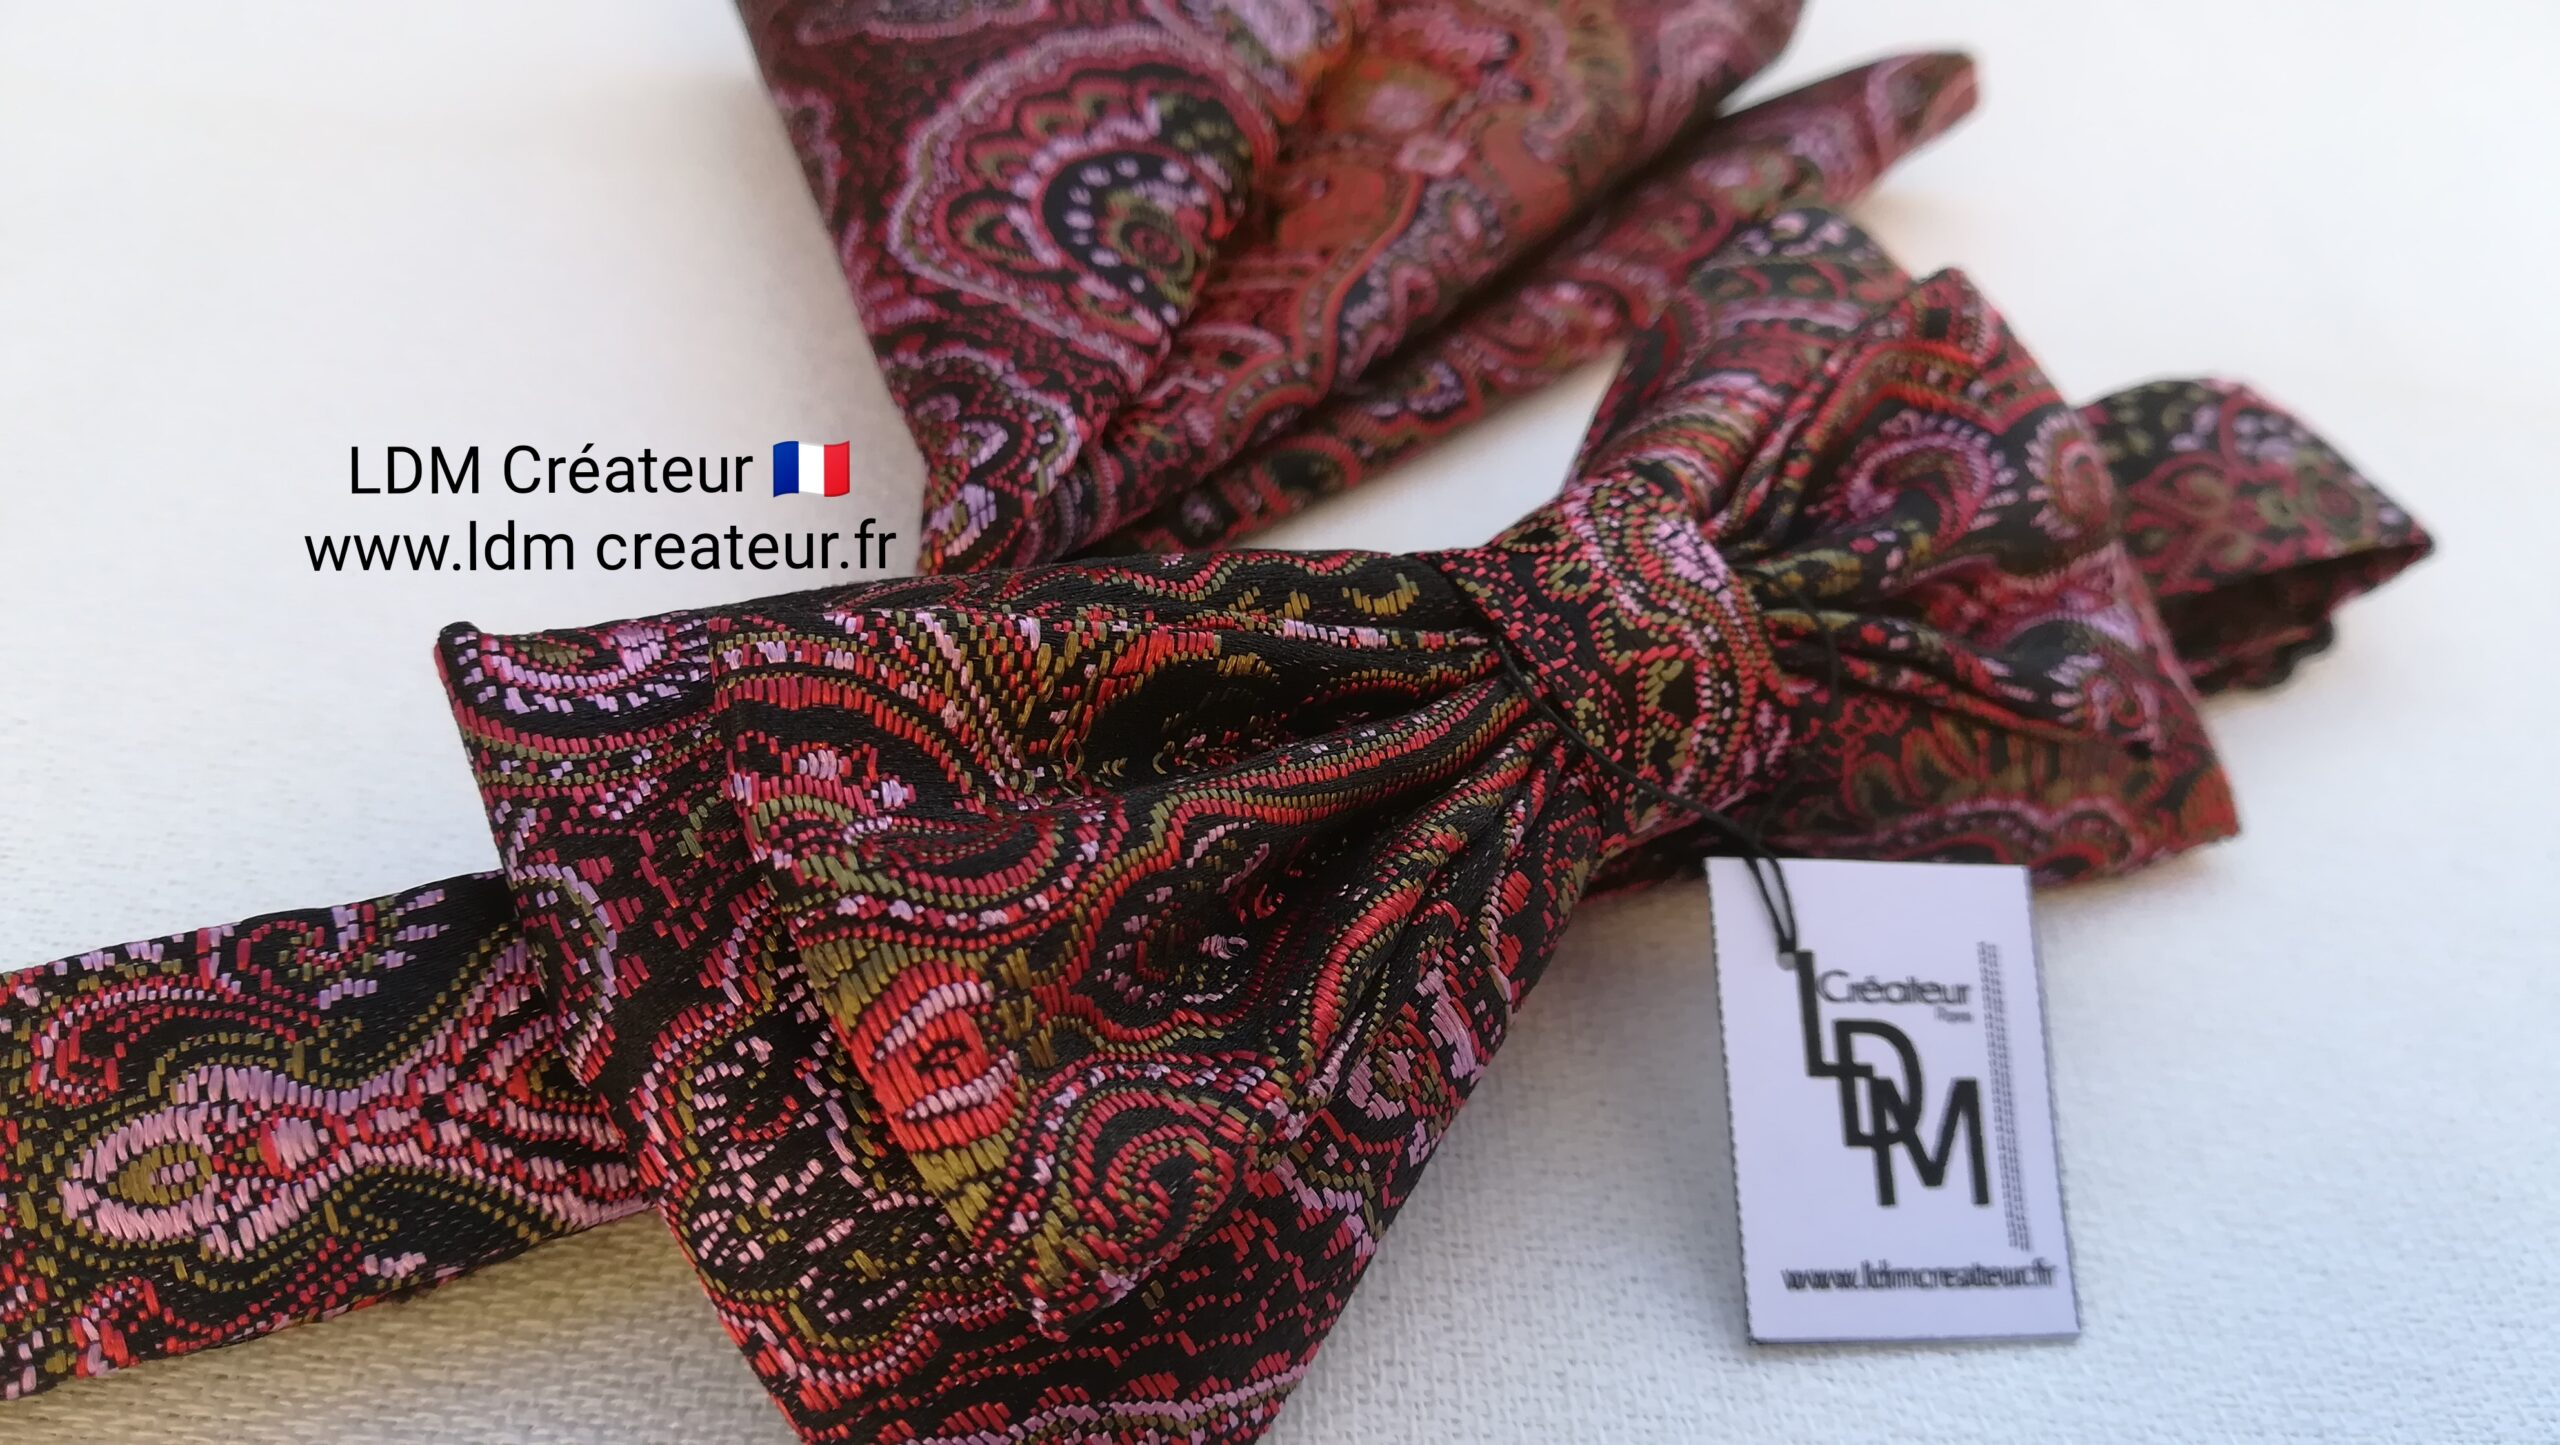 Noeud-papillon-rose-pochette-homme-marie-soiree-costume-Tournai-ldmcreateur